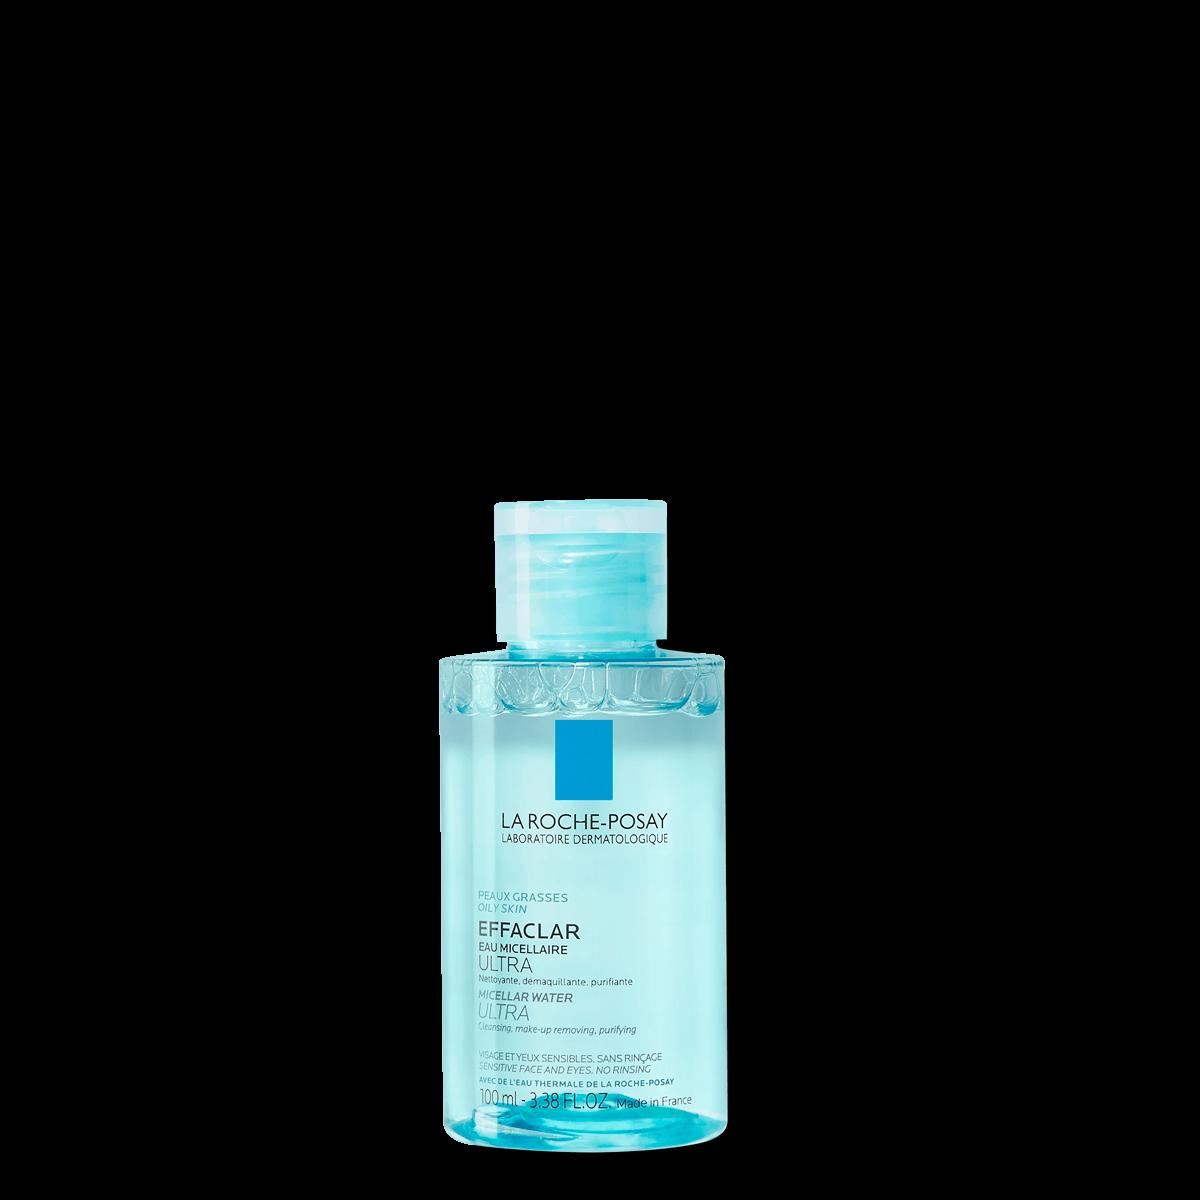 La Roche Posay Kasvojen puhdistustuote Effaclar Micellar Water Ultra 100ml 33378